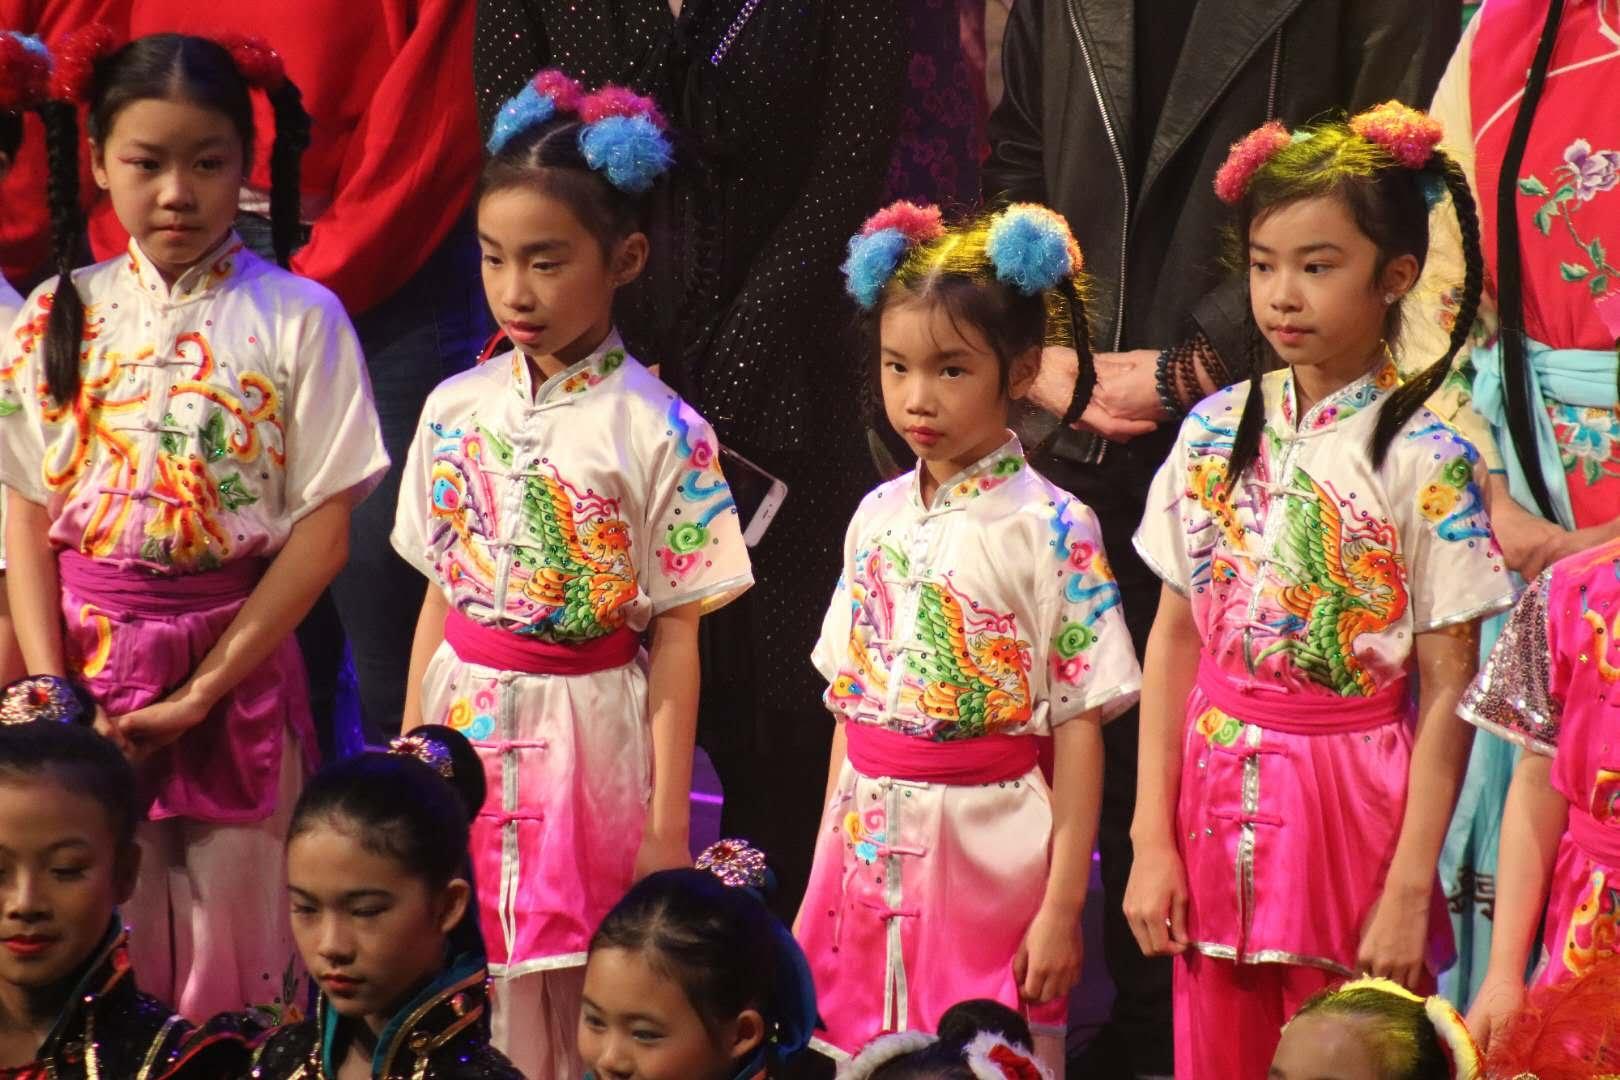 wayland-li-wushu-fairchild-toronto-spring-festival-gala-2018-05.jpg